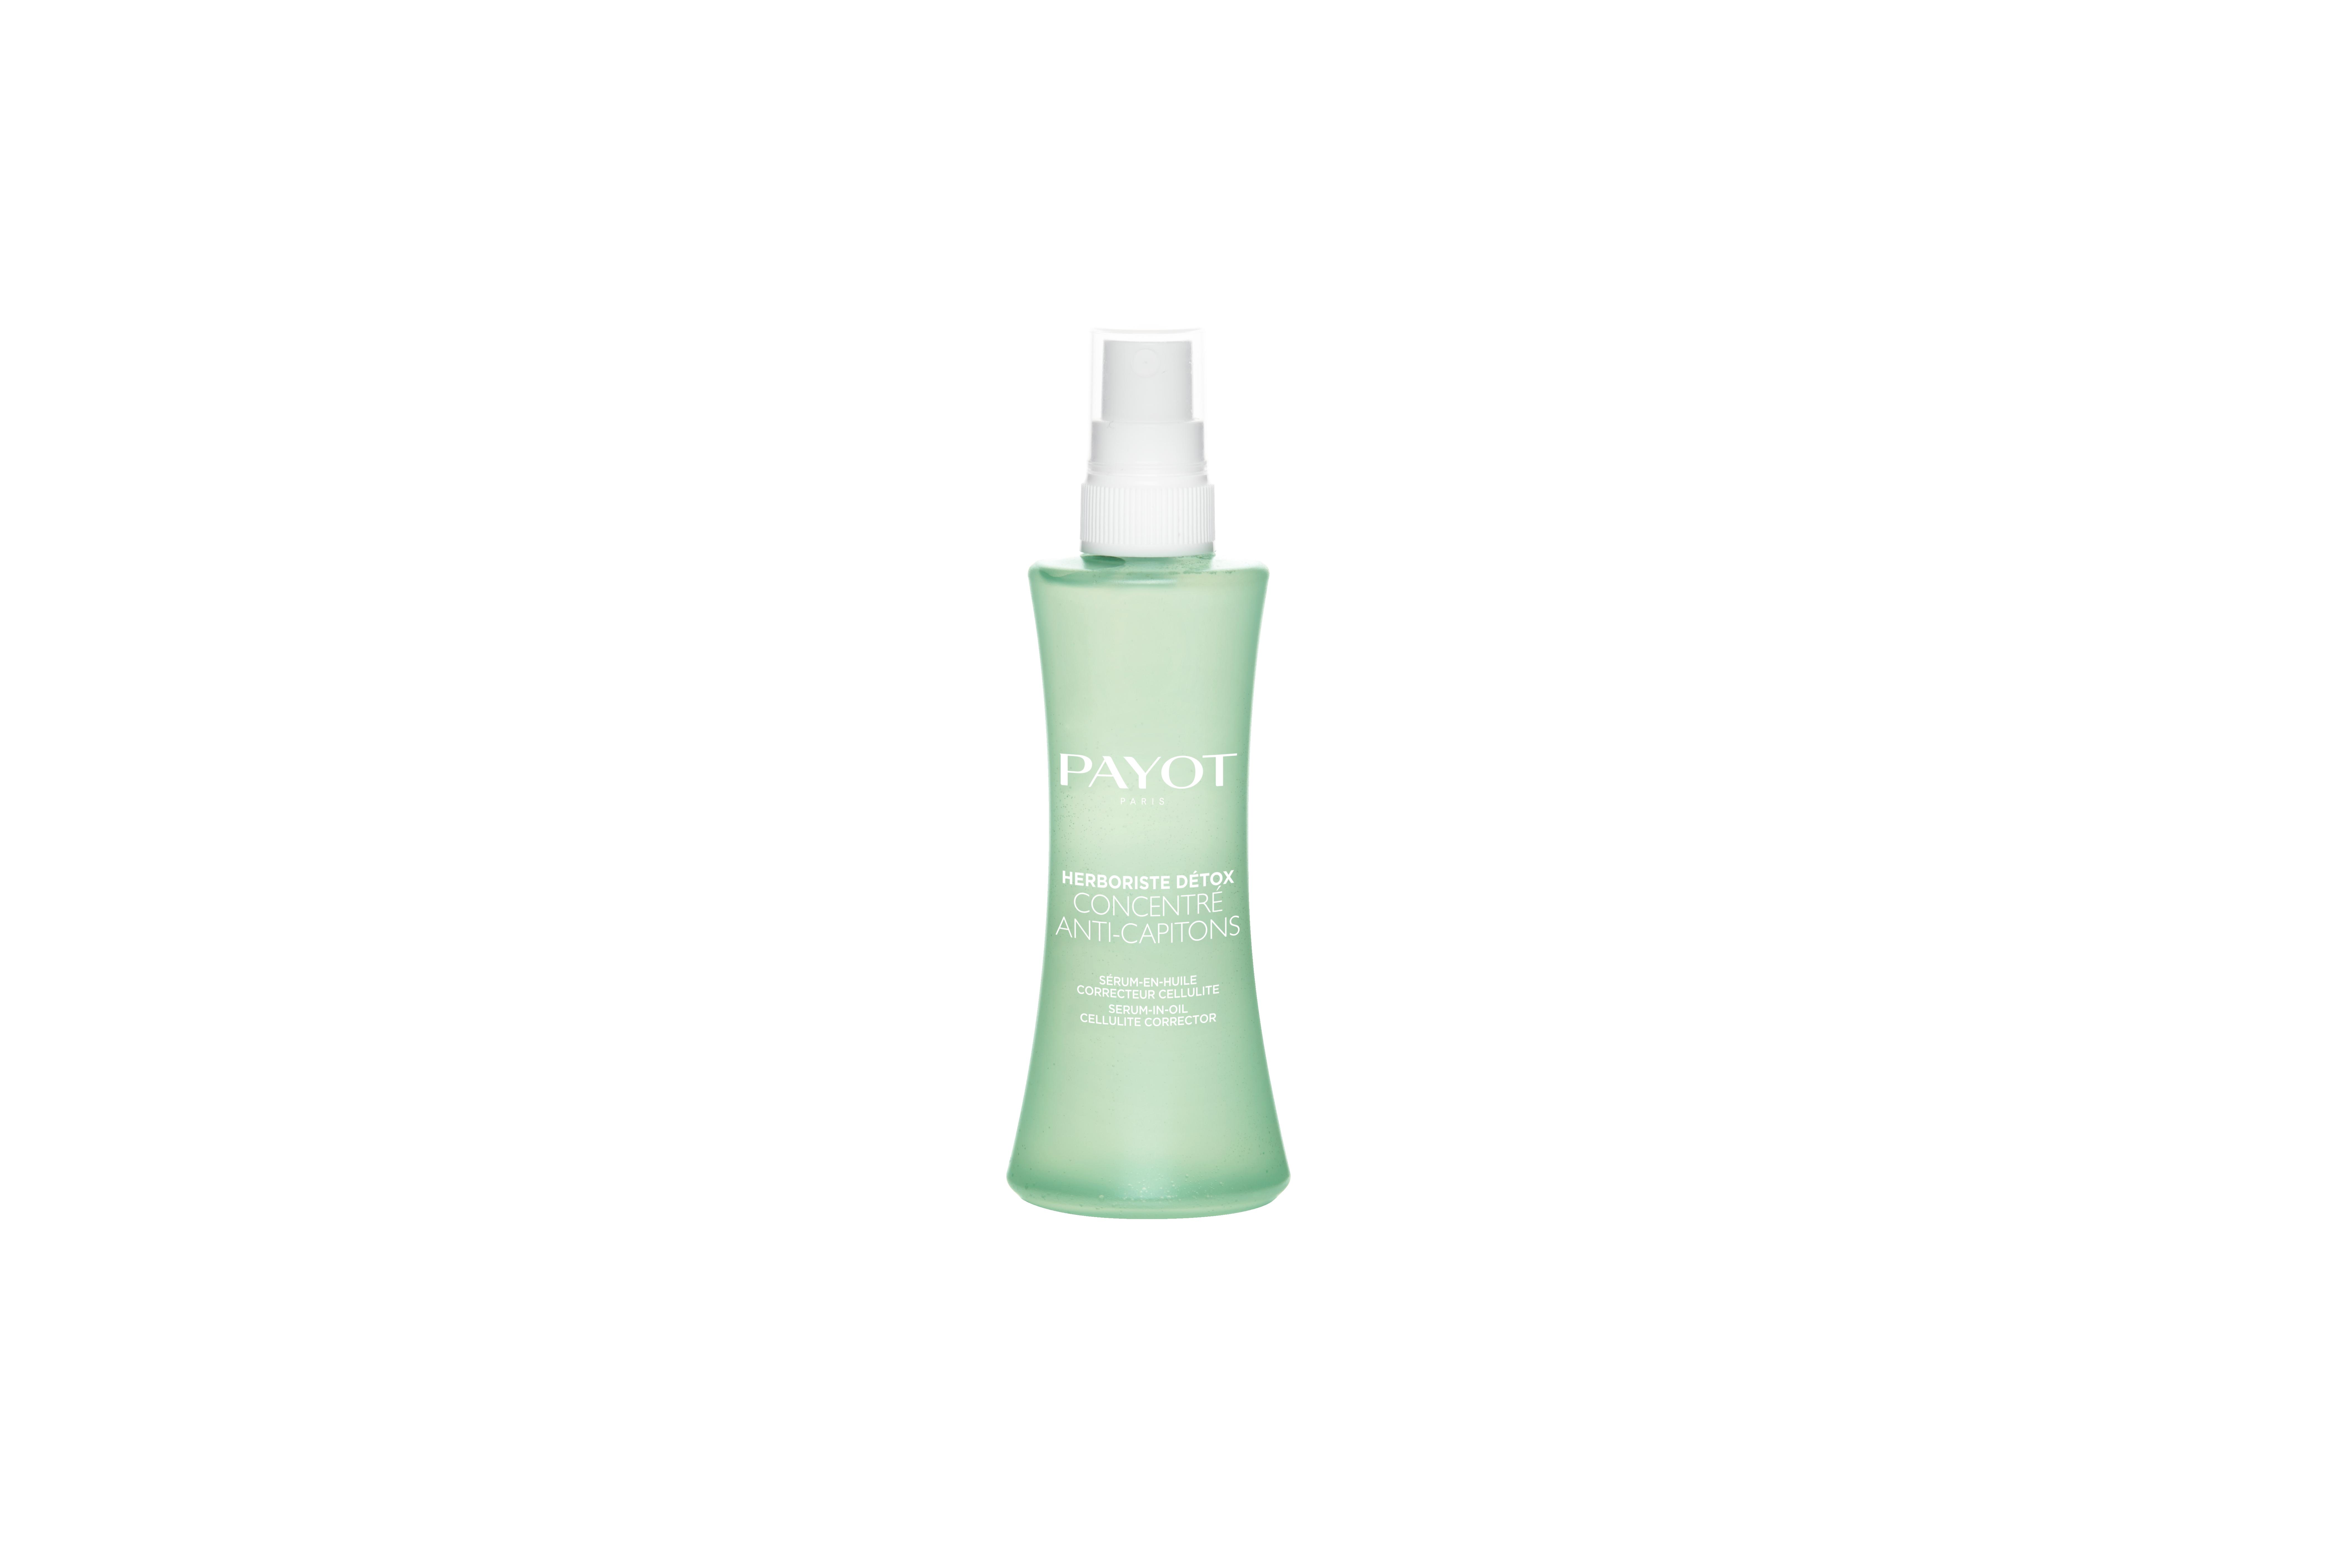 Payot Herboriste Detox /Öl-Serum Concentre Anti-Capitons